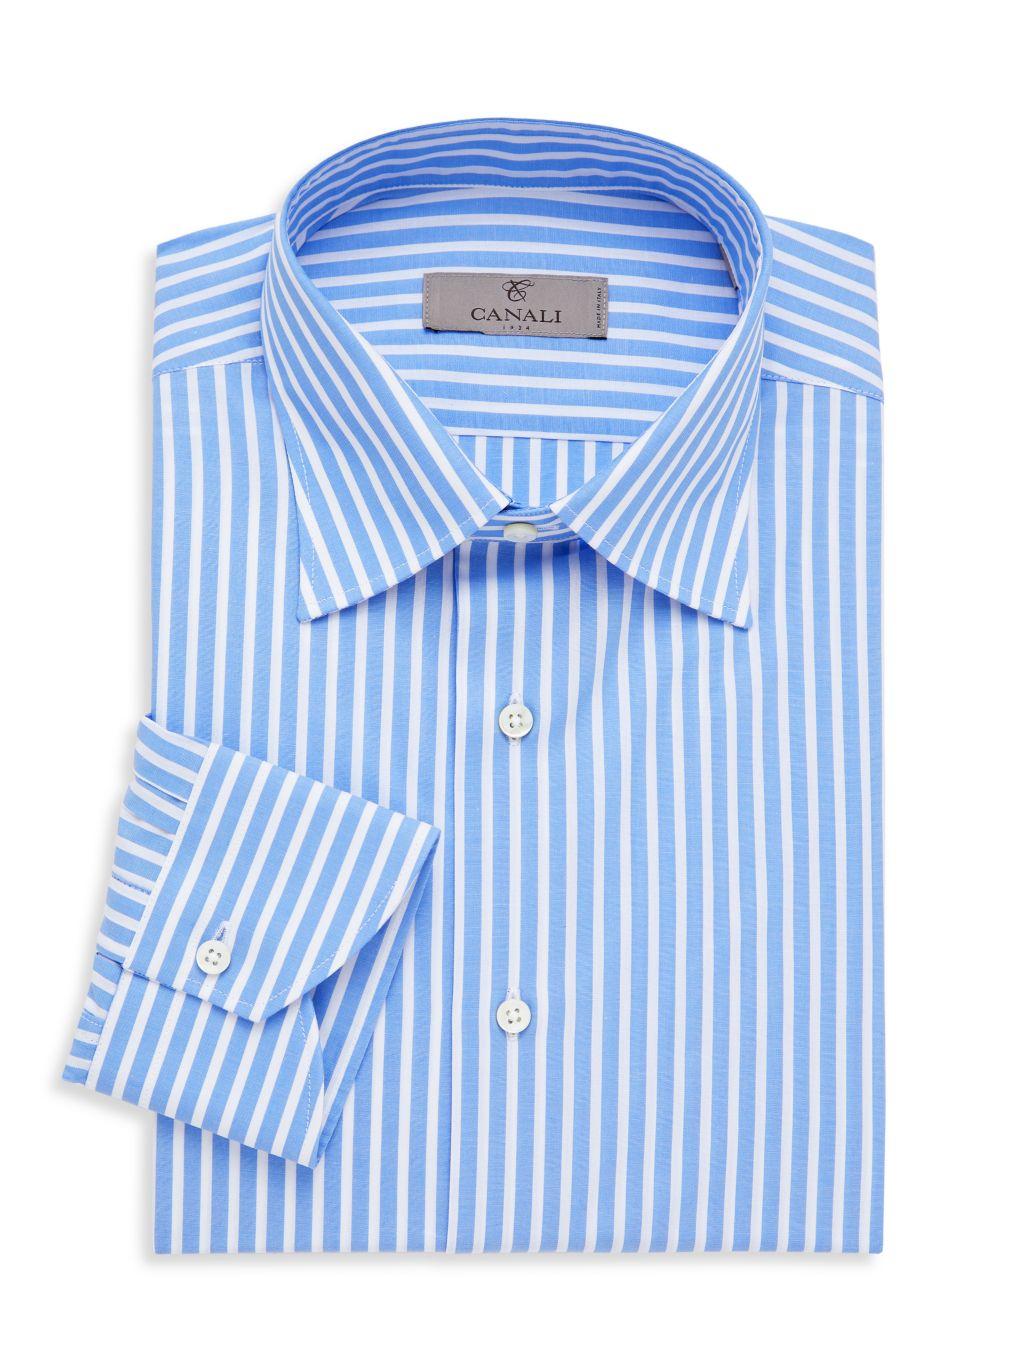 Canali Modern-Fit Striped Dress Shirt